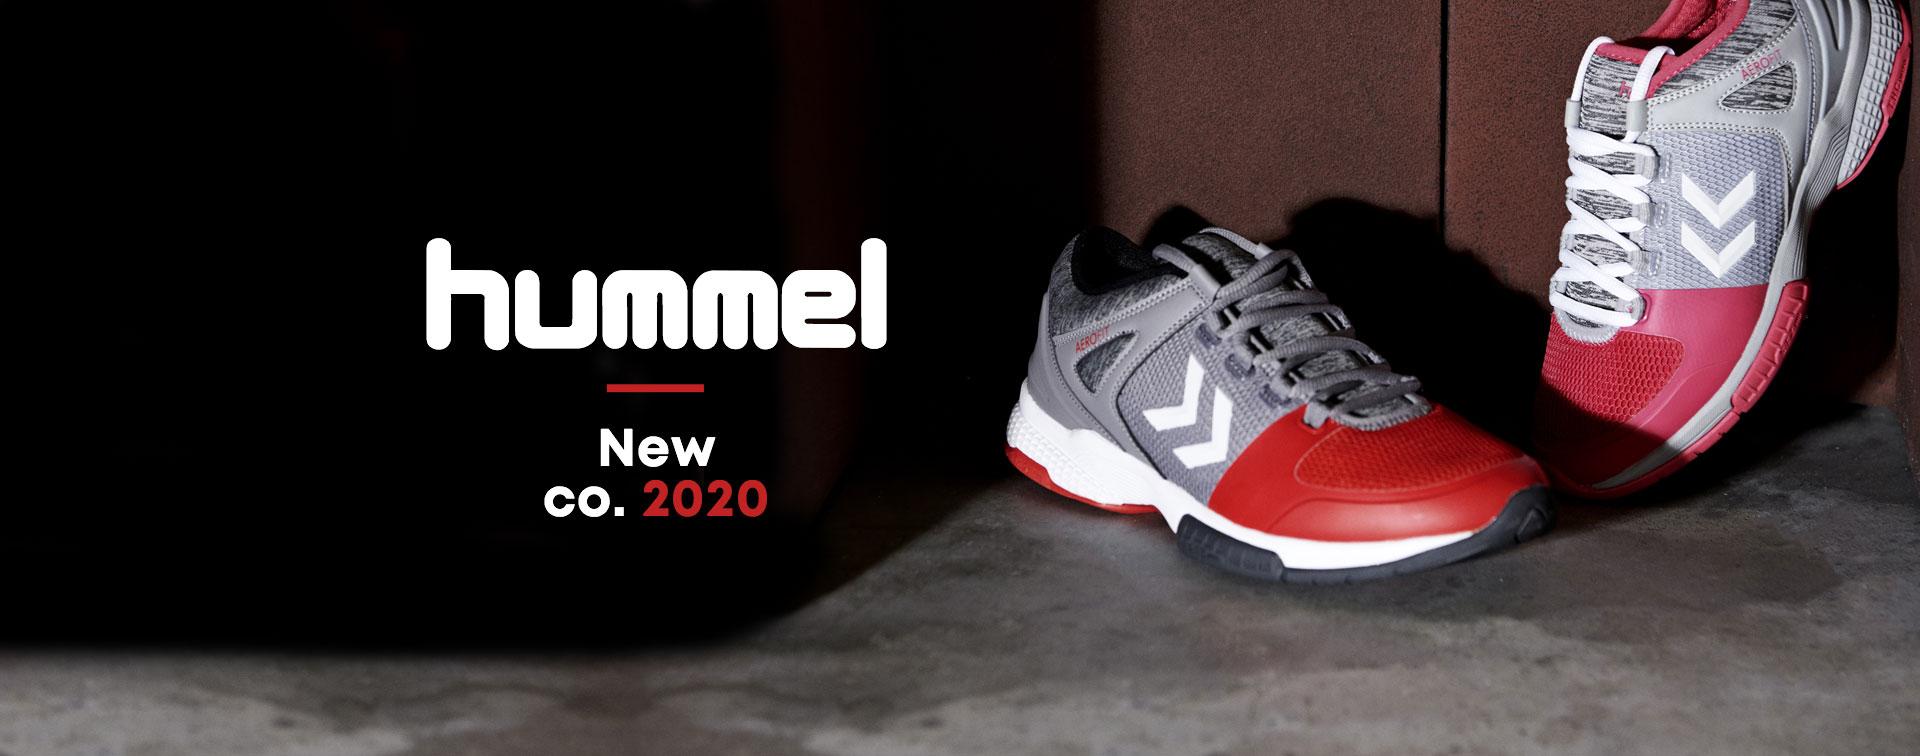 New Hummel shoes 2020